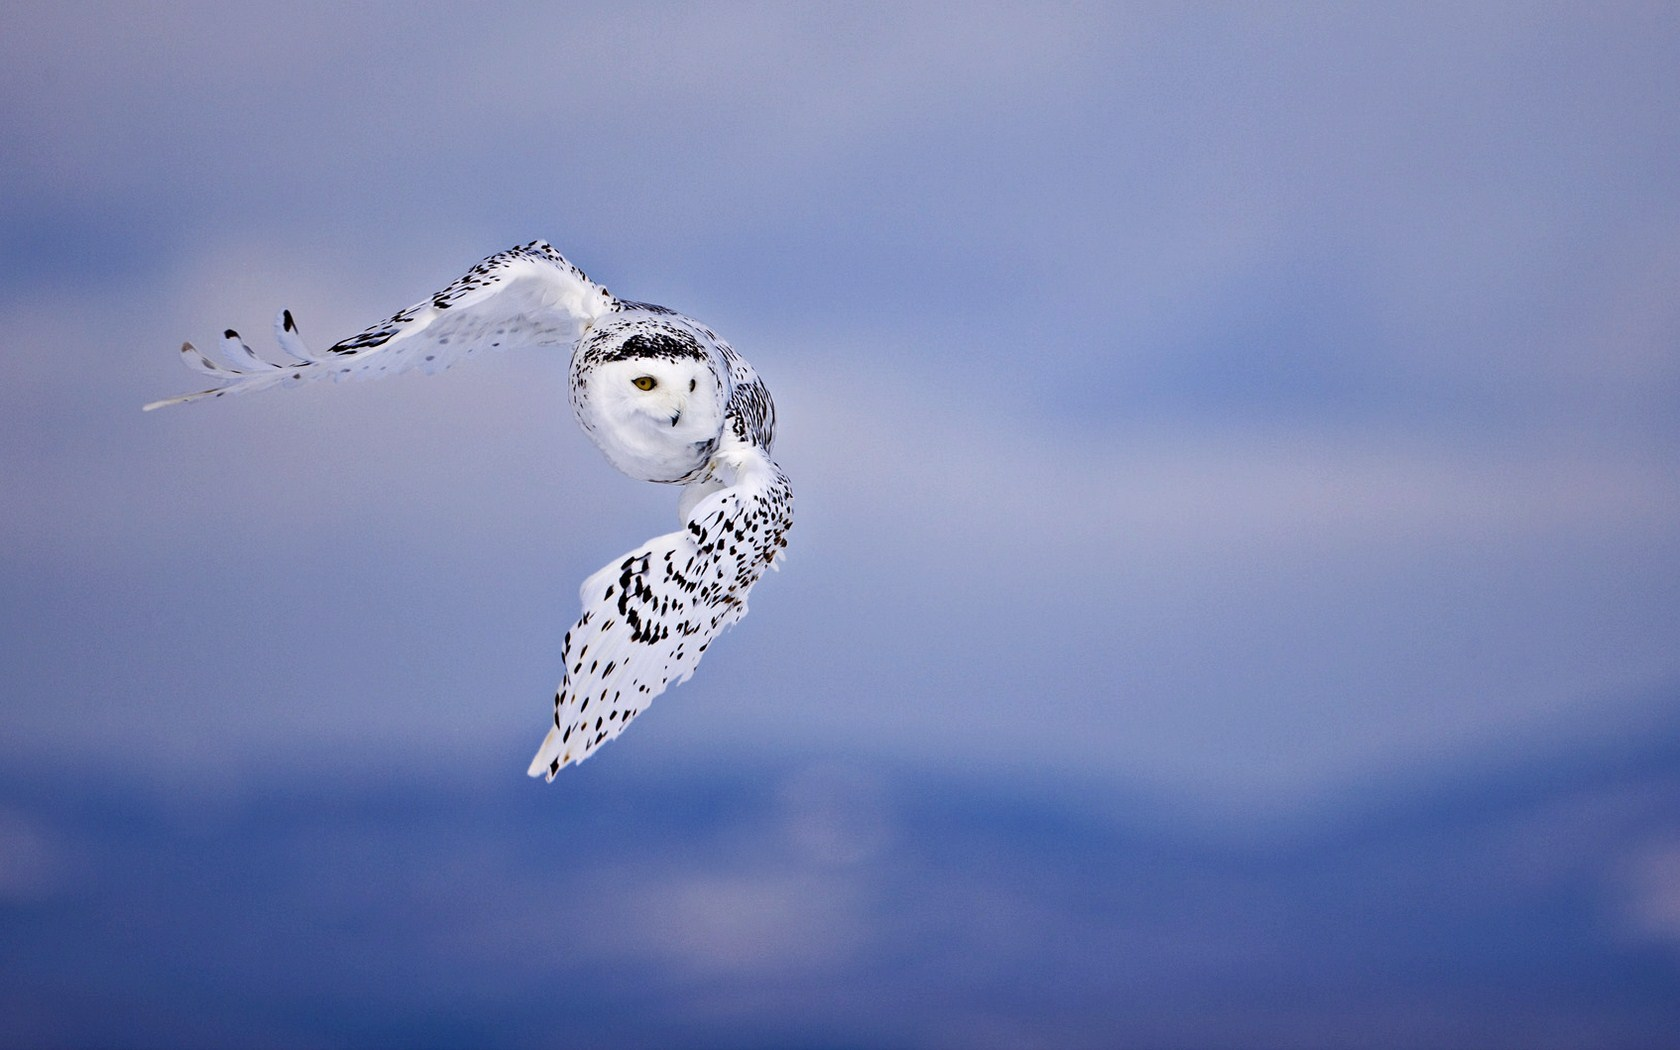 Flying Owl Wallpaper 1680x1050